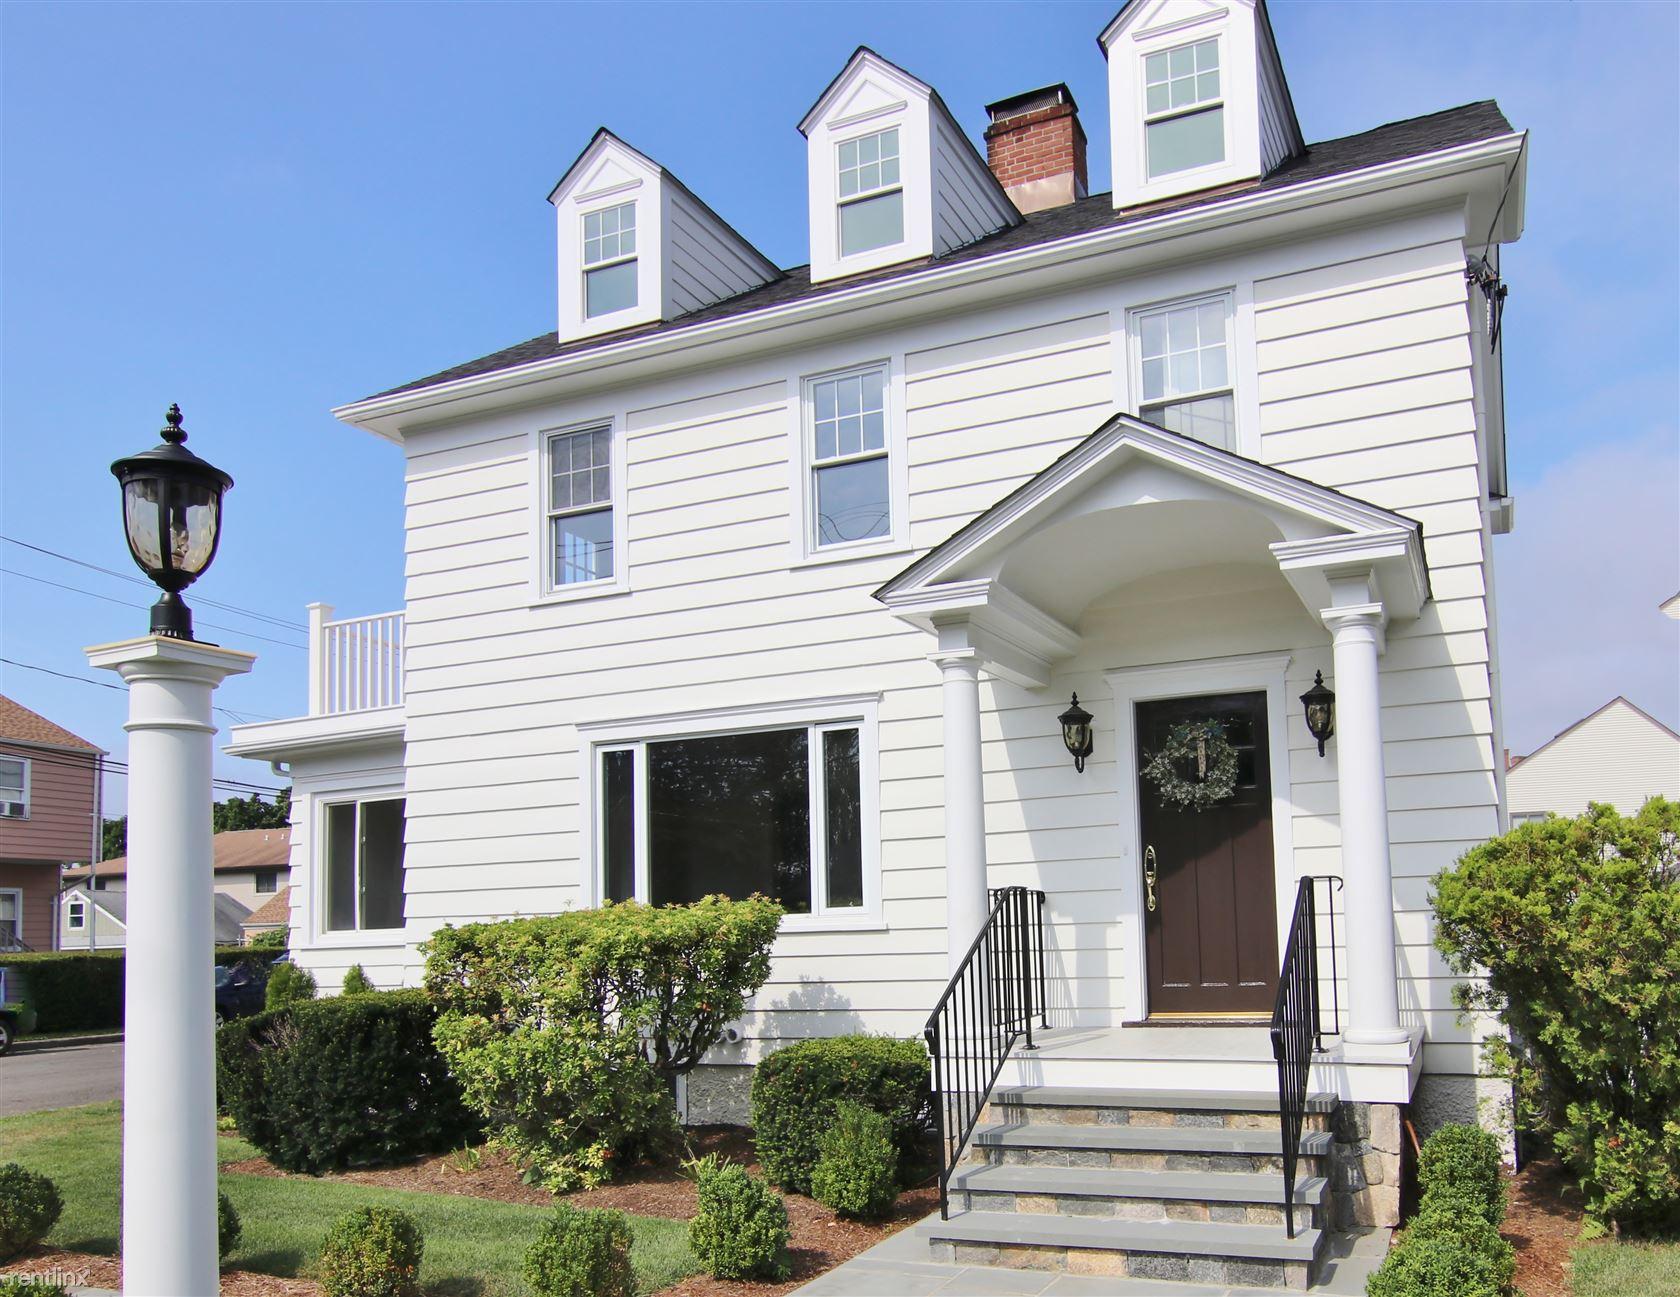 965 Shippan Ave Unit A, Stamford, CT - $4,900